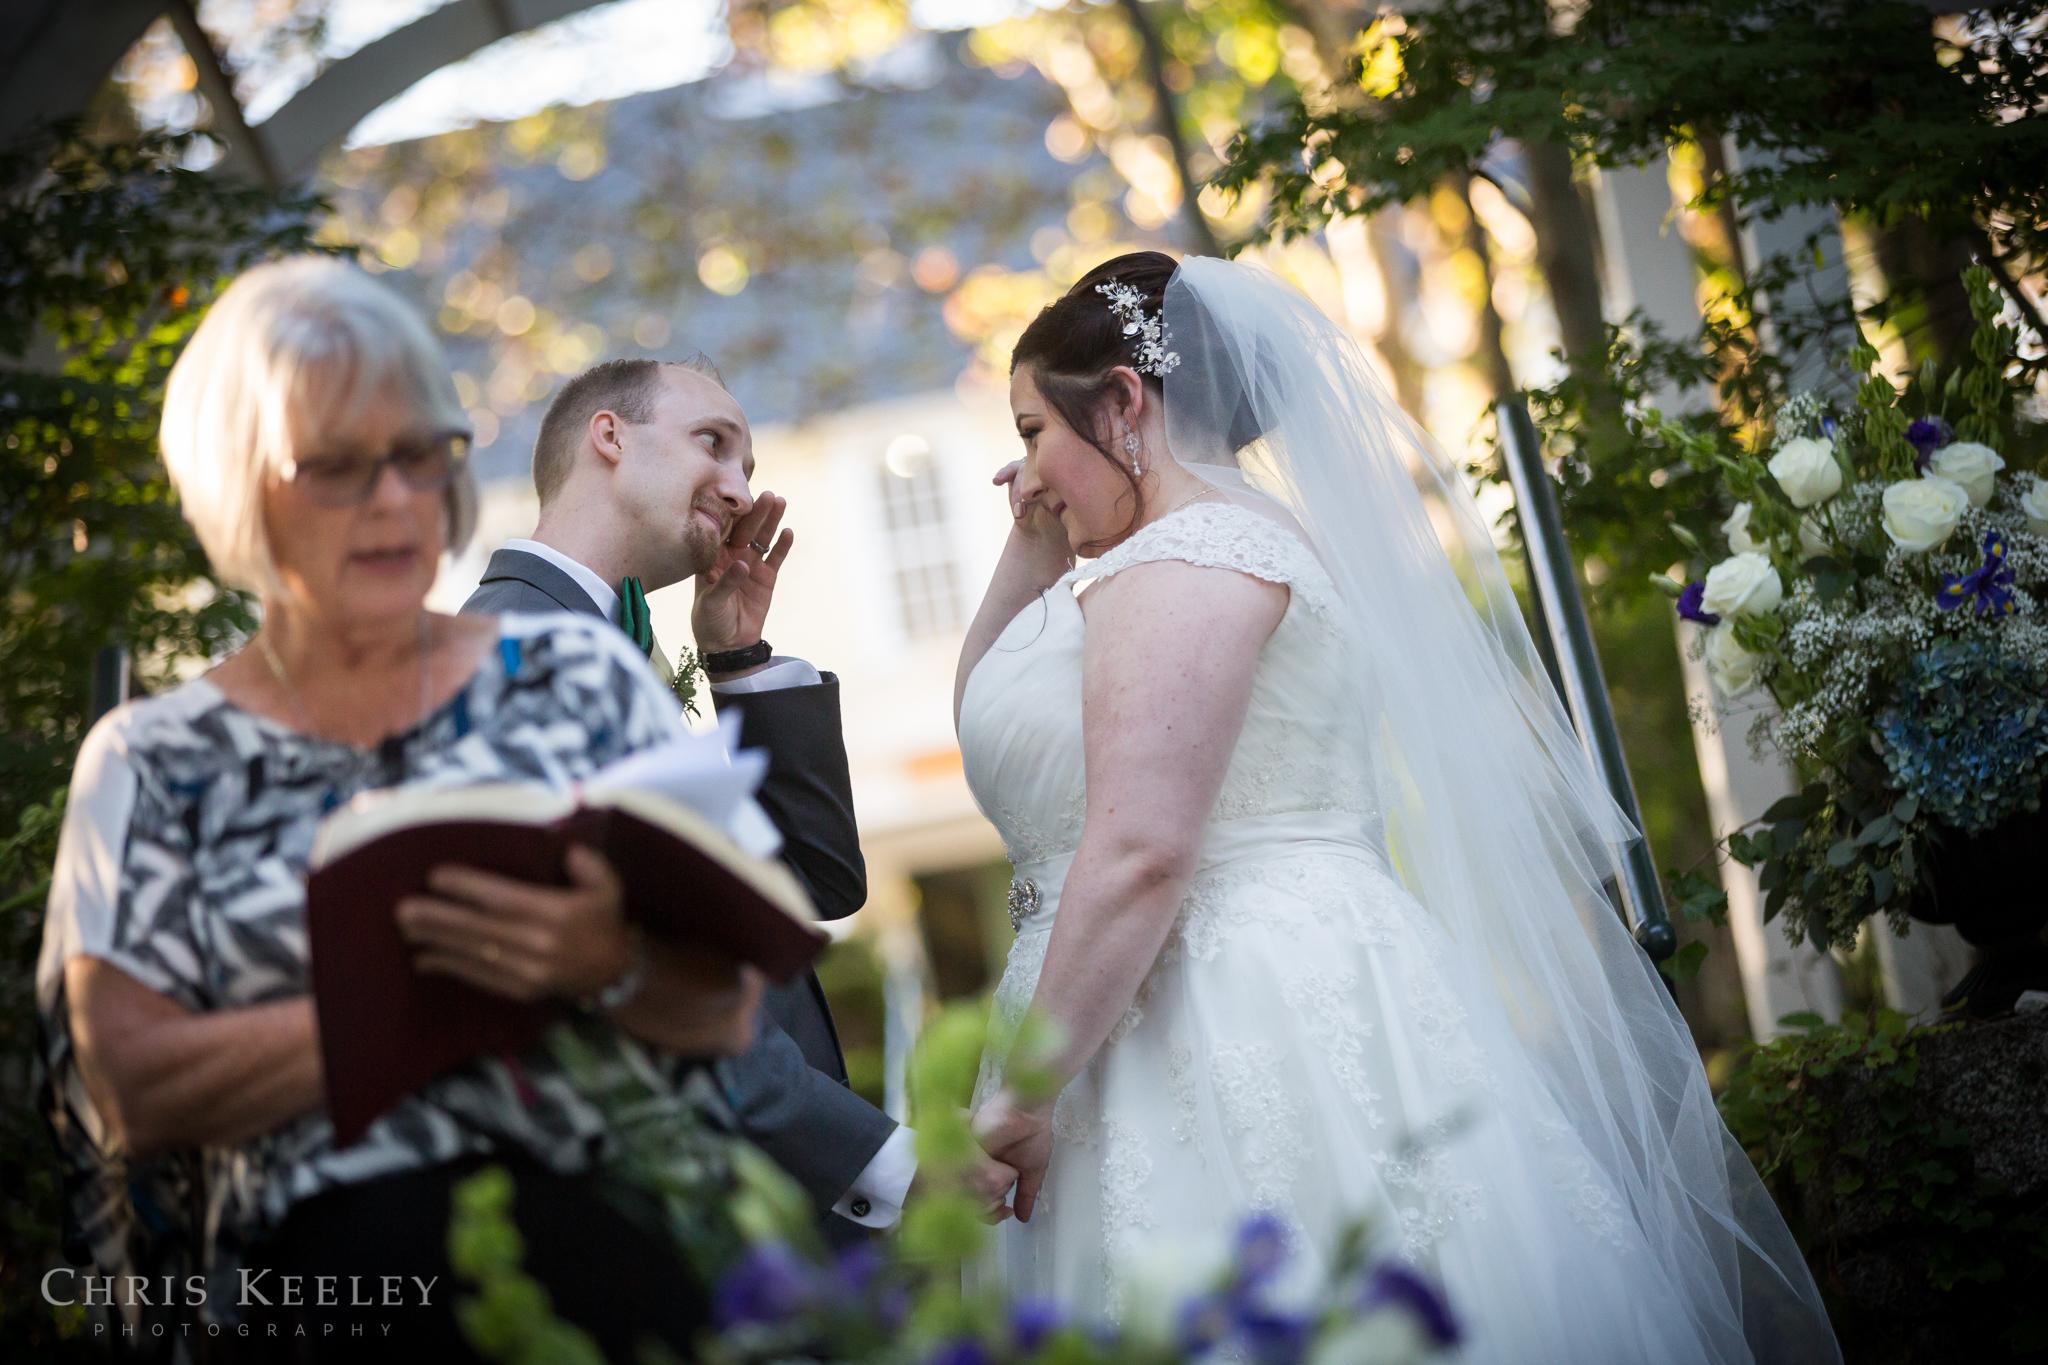 new-hampshire-wedding-photographer-three-chimneys-inn-chris-keeley-photography-17.jpg